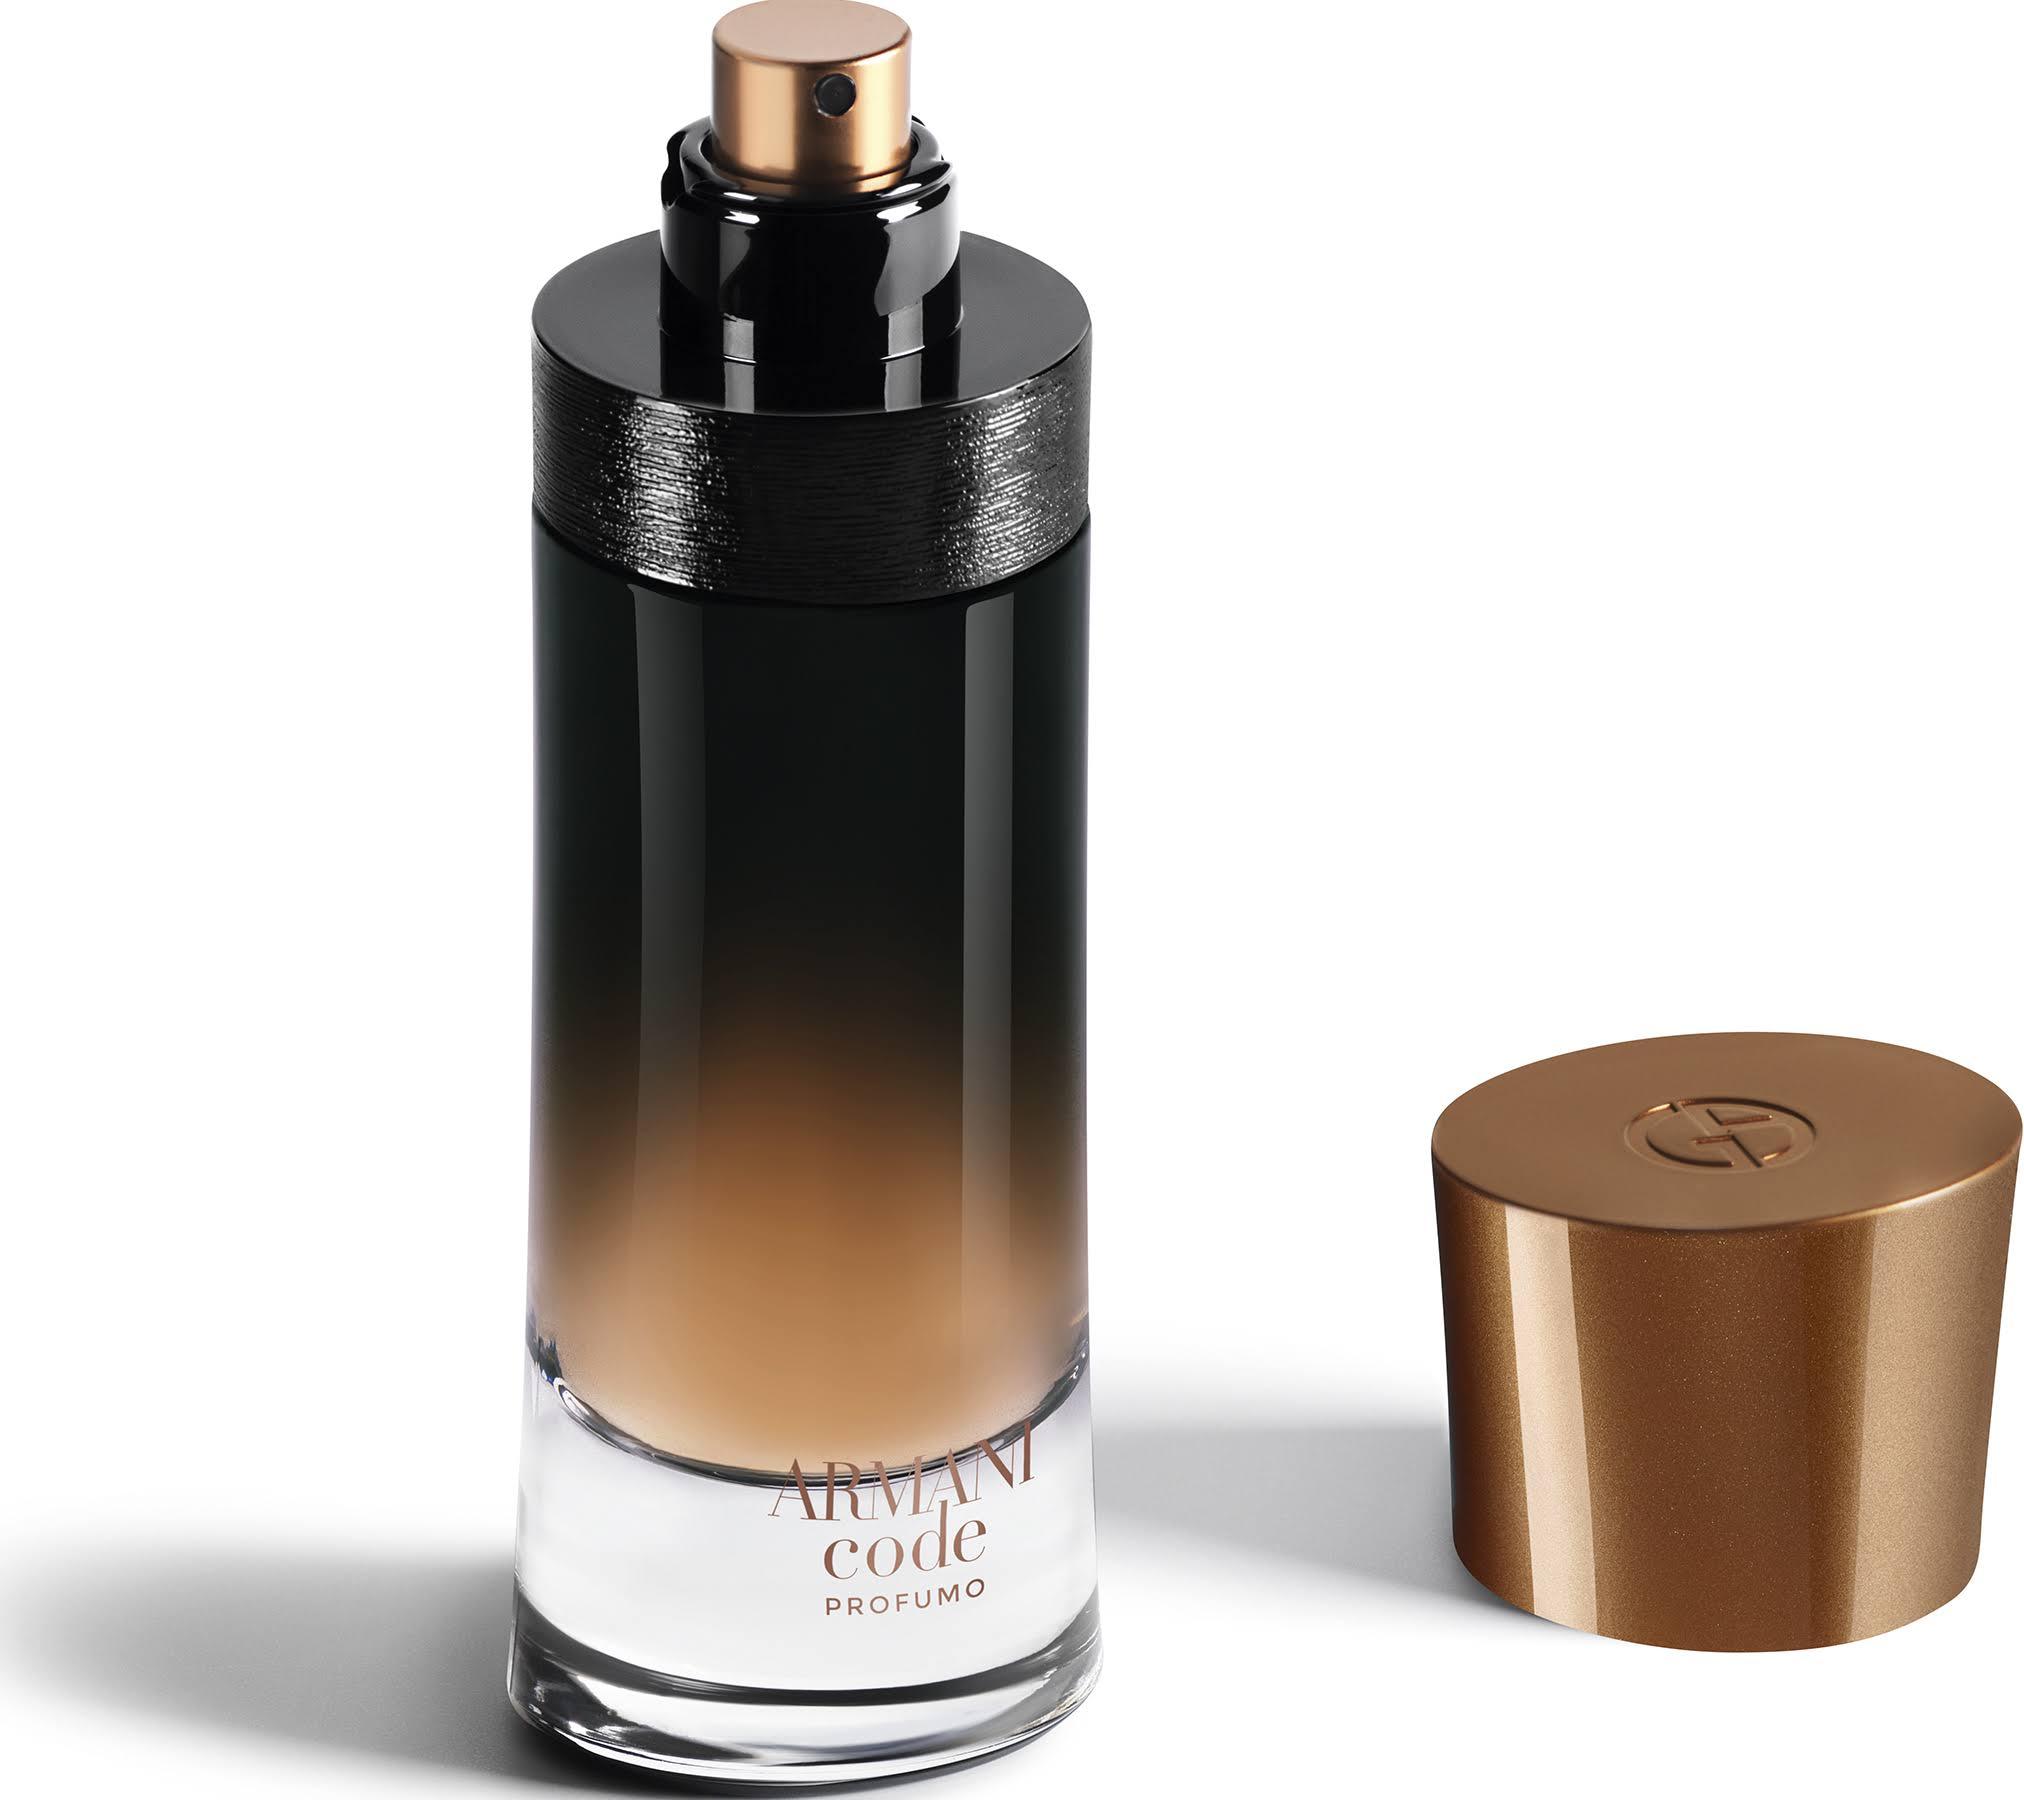 Parfum Code Parfum Armani Profumo Code Profumo Armani Armani Code AggIrq